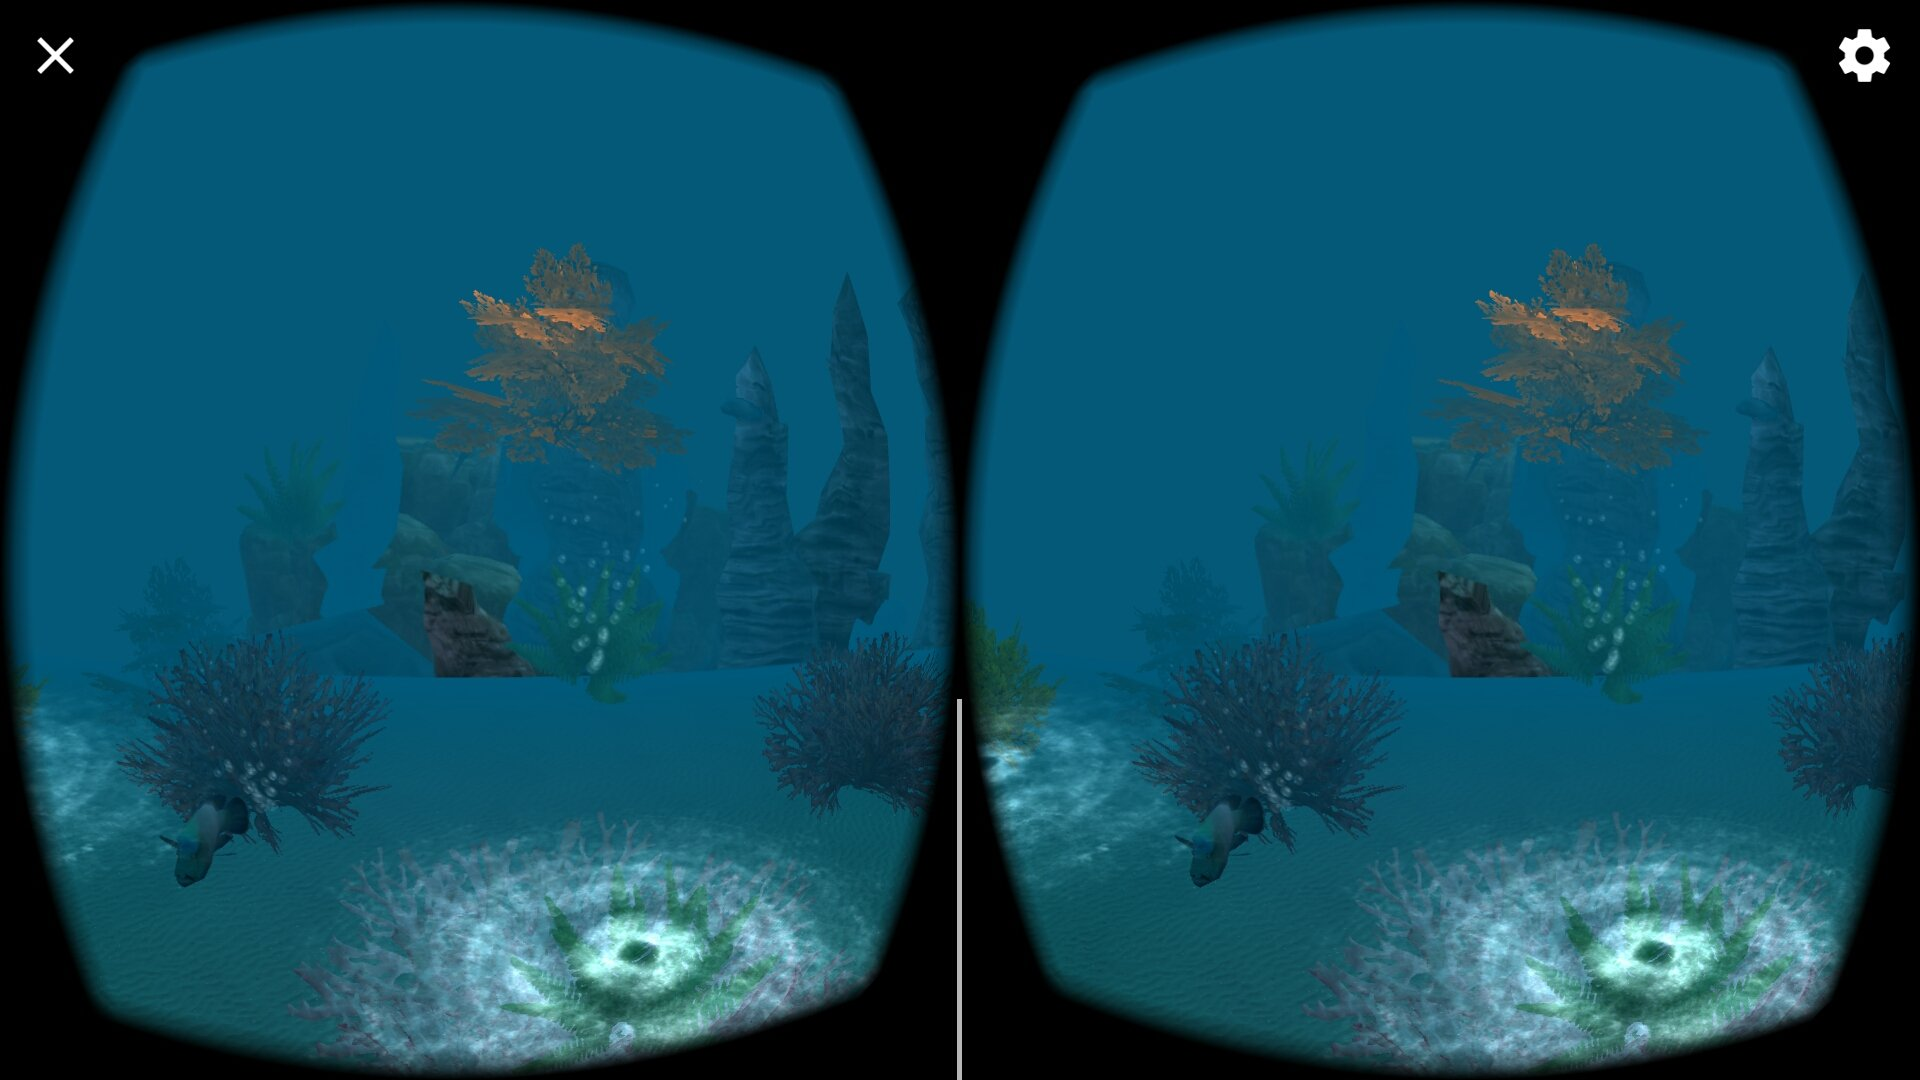 vr abyss sharks sea worlds for google cardboard jeux pour android t l chargement gratuit. Black Bedroom Furniture Sets. Home Design Ideas